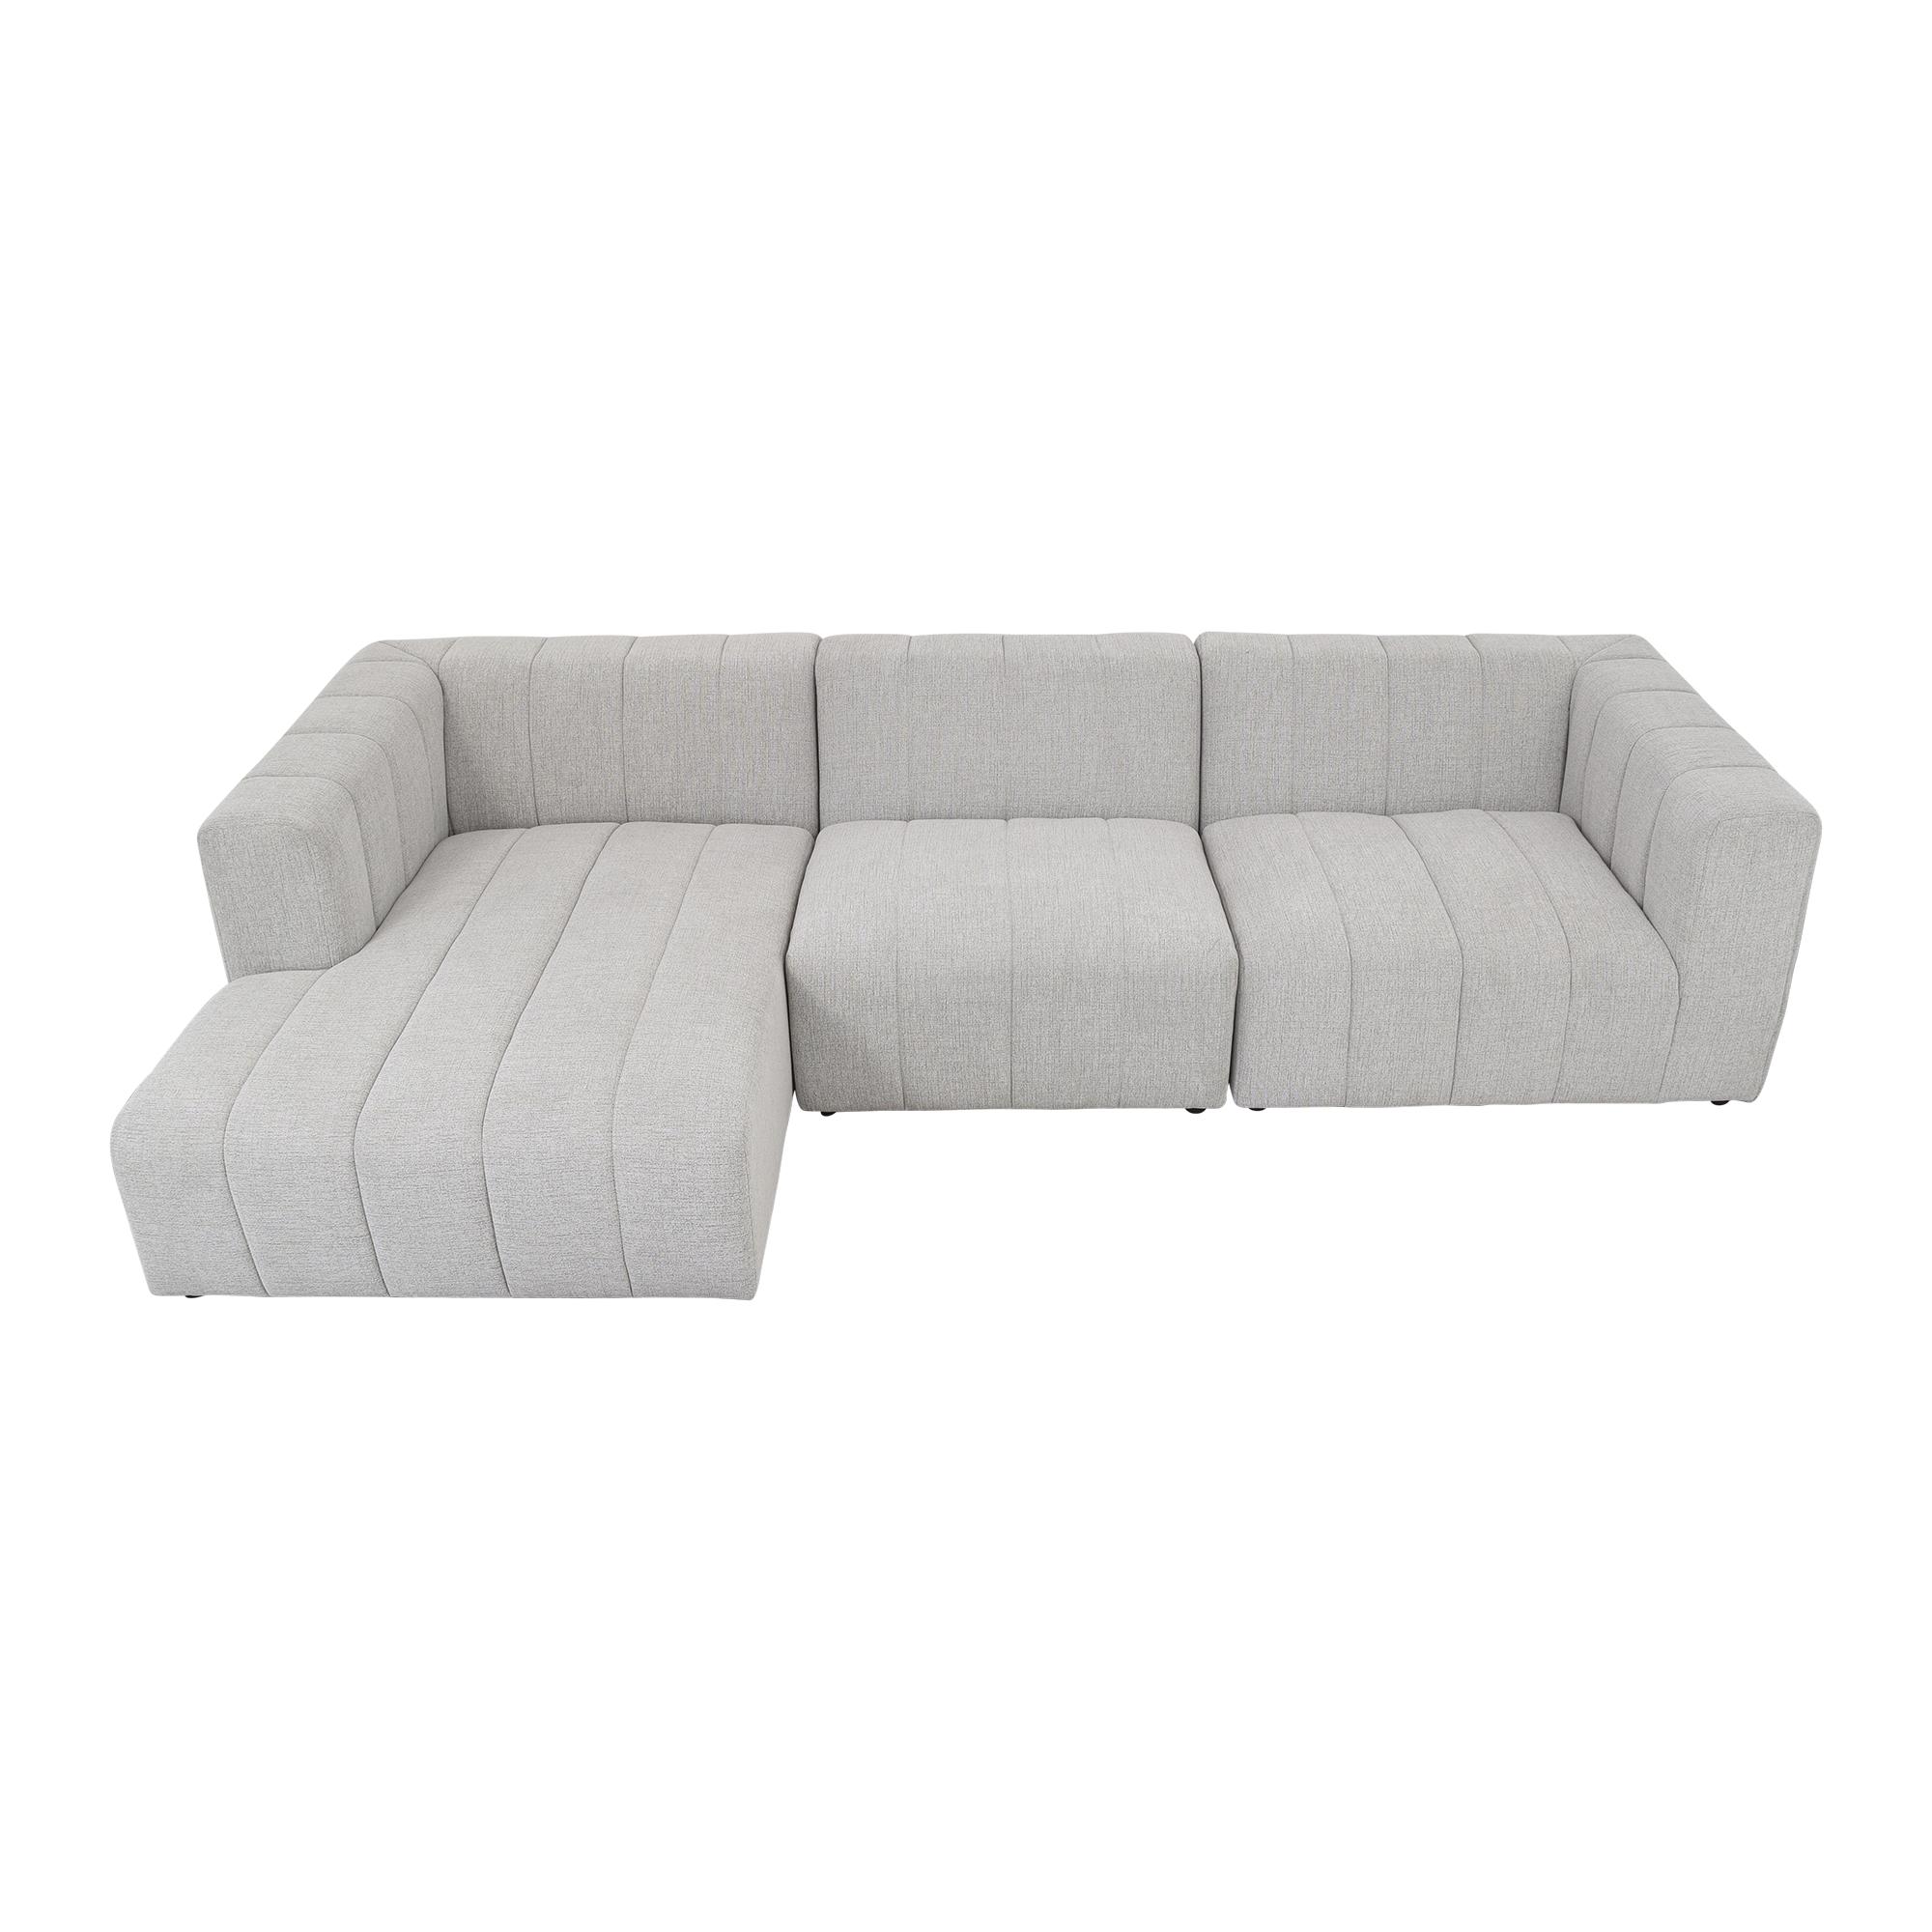 Four Hands Four Hands Langham Modular Sofa price